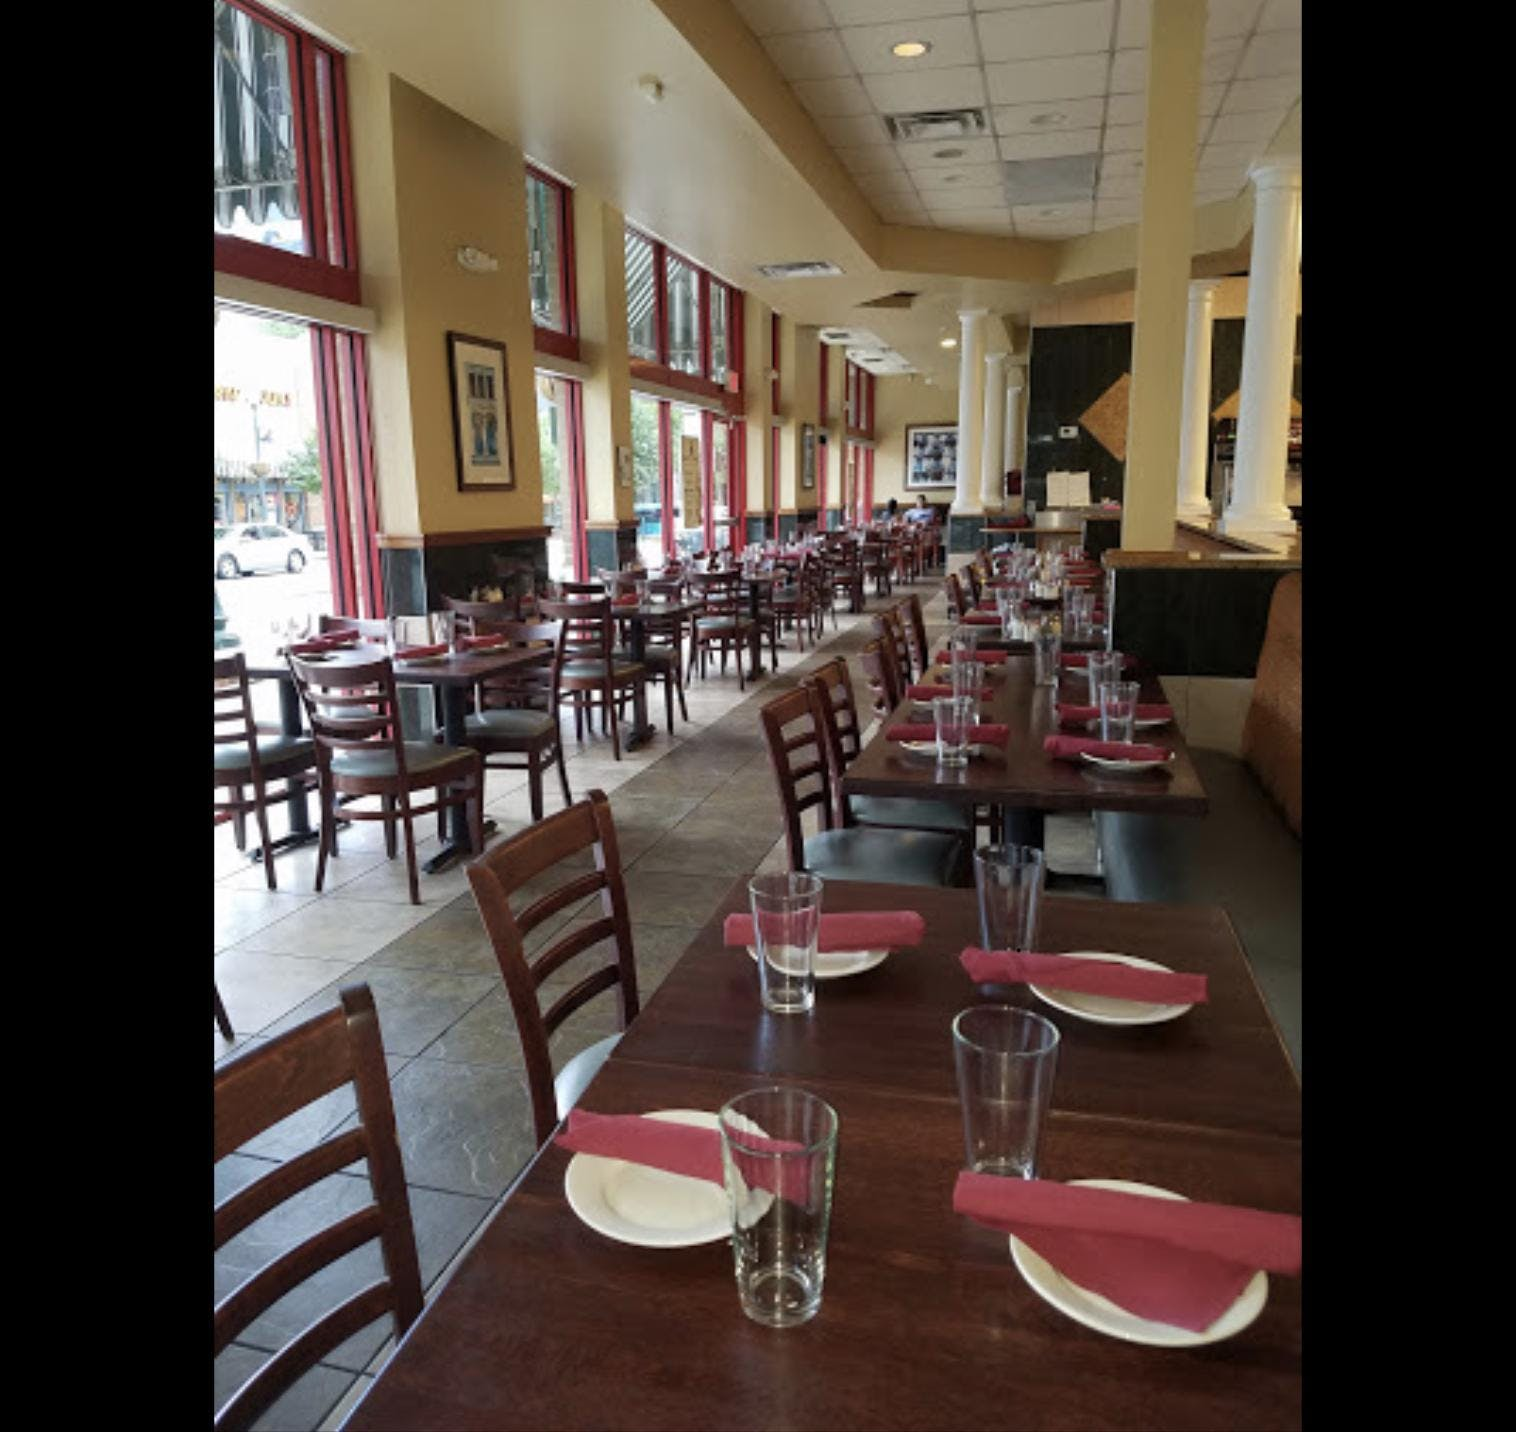 Photo of Mamma Lucia's dining area